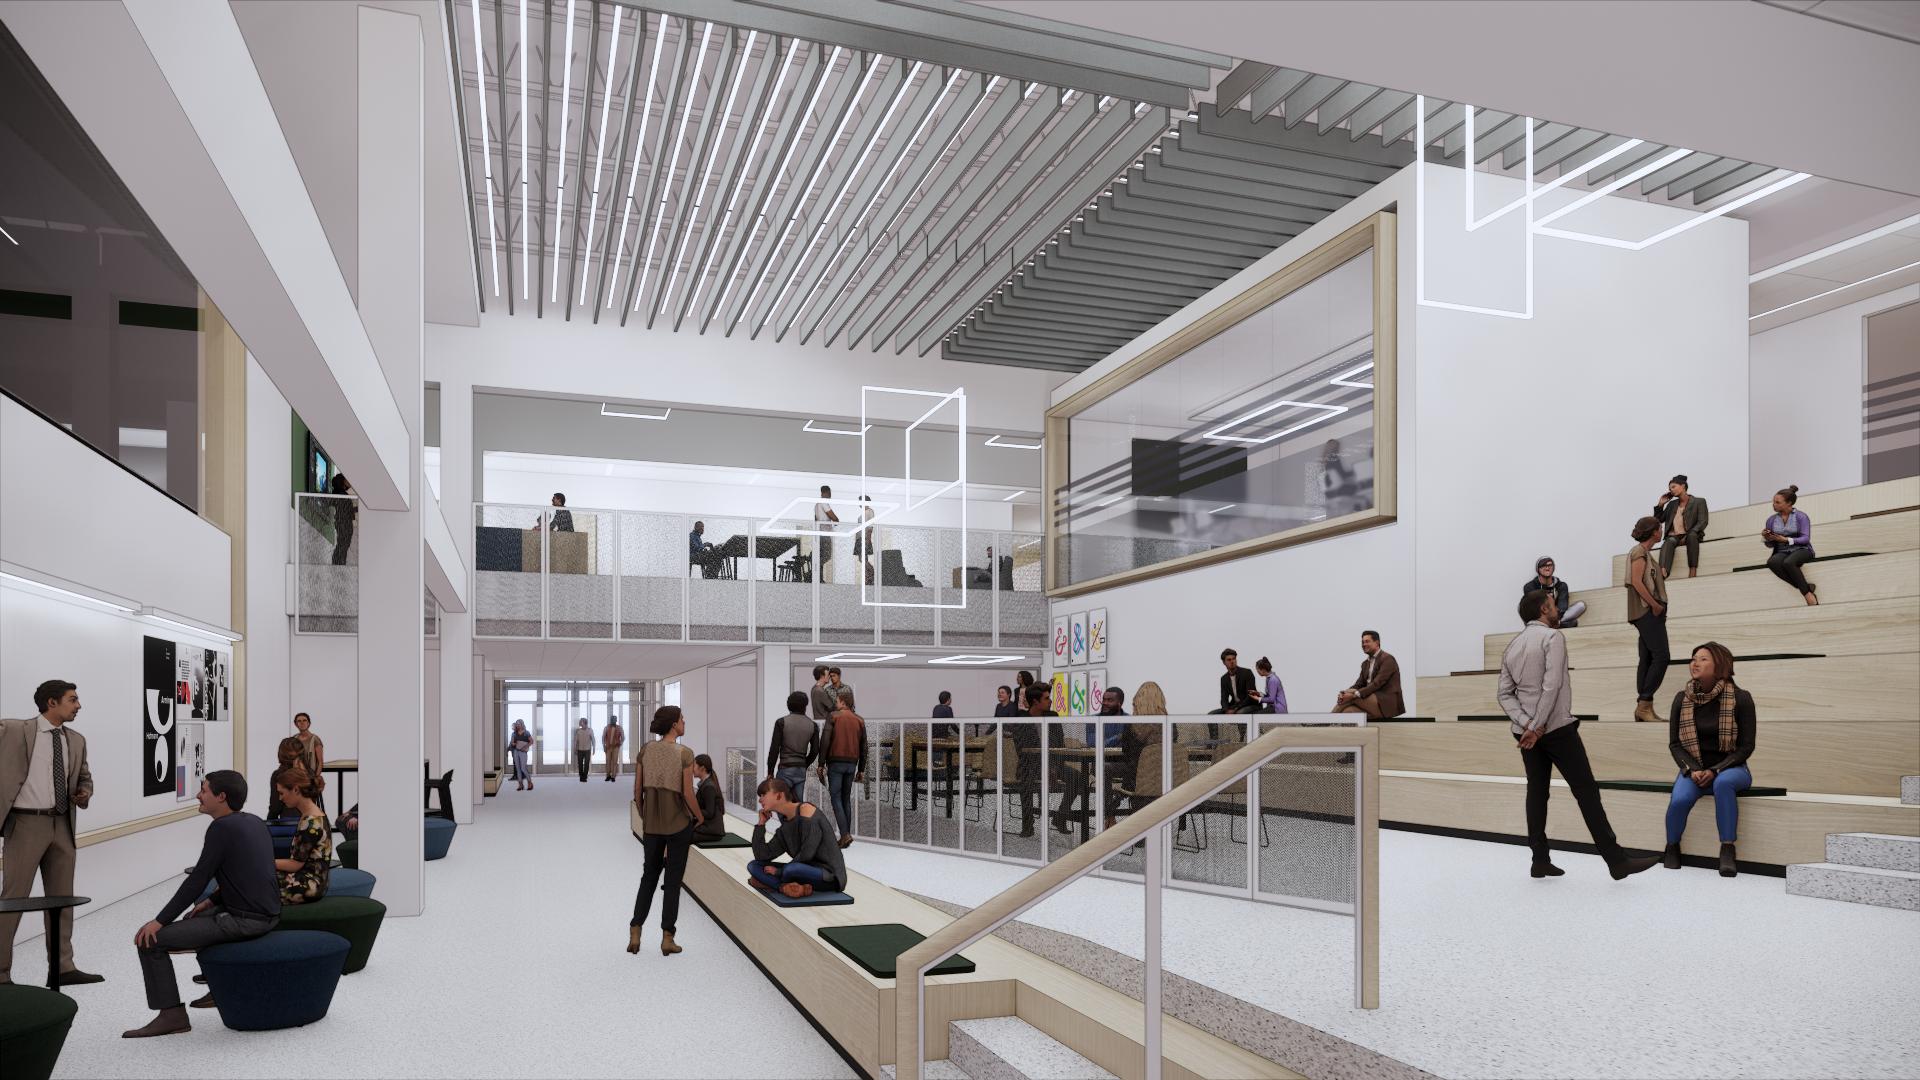 Interior Rendering of the future Hewitt Hall at SUNY Oswego